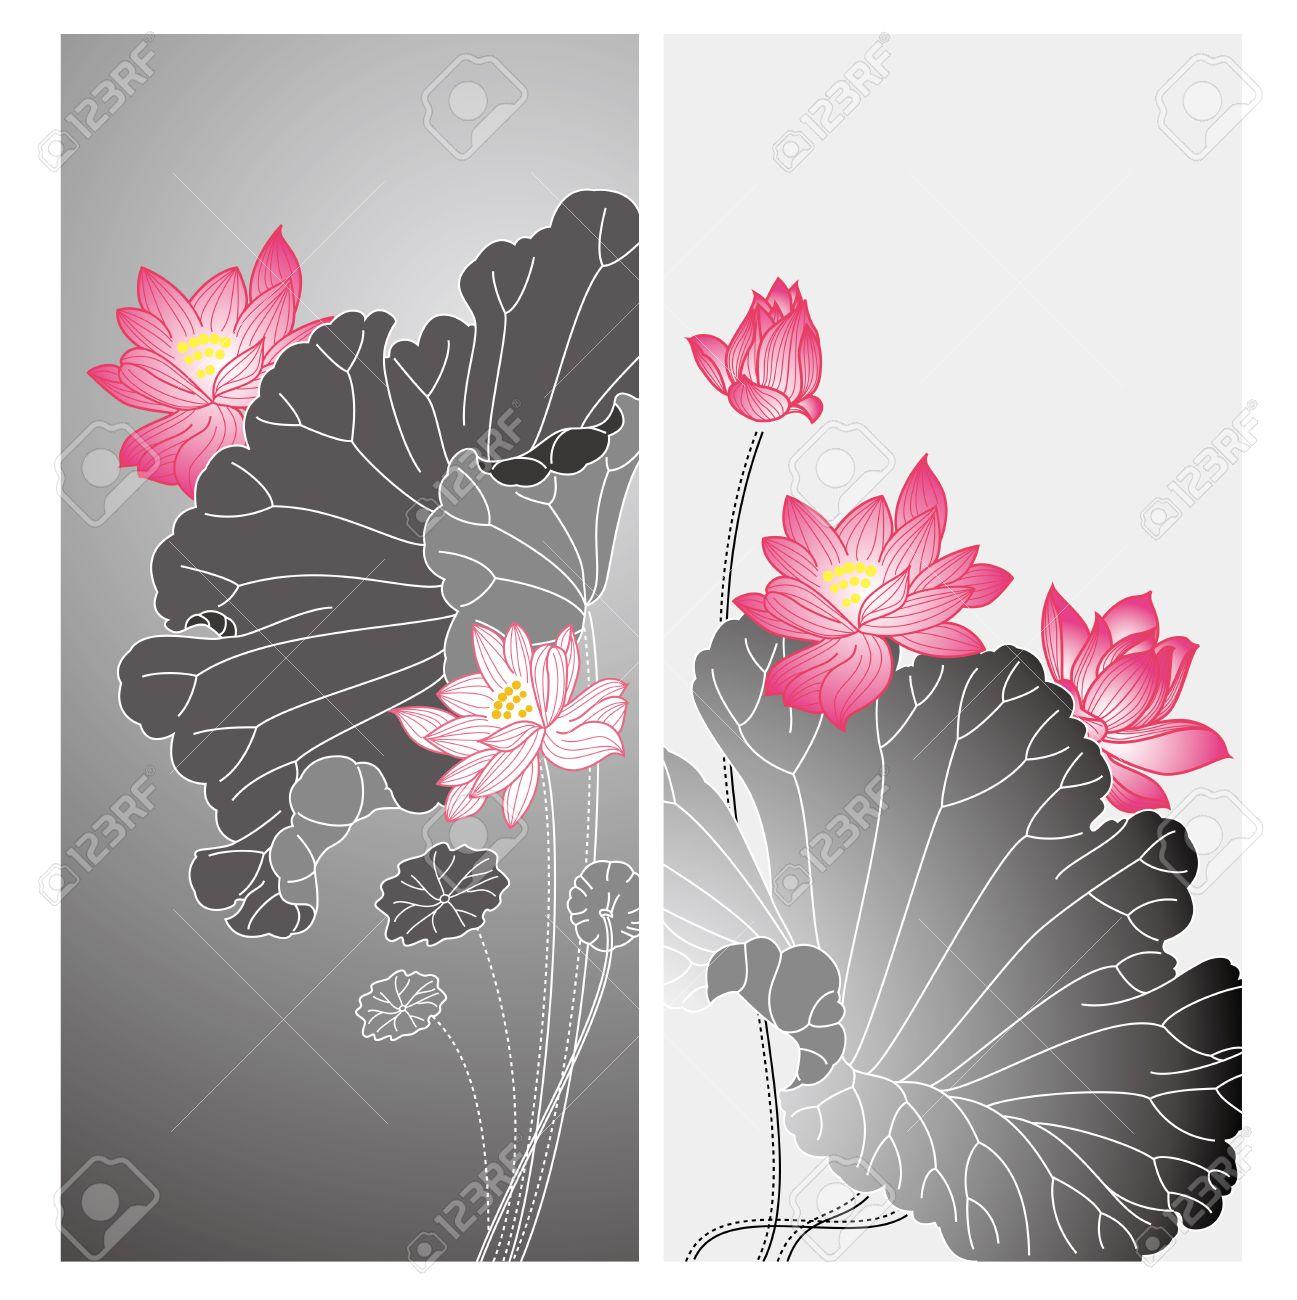 lotus flower design chinese style lotus flower drawing card